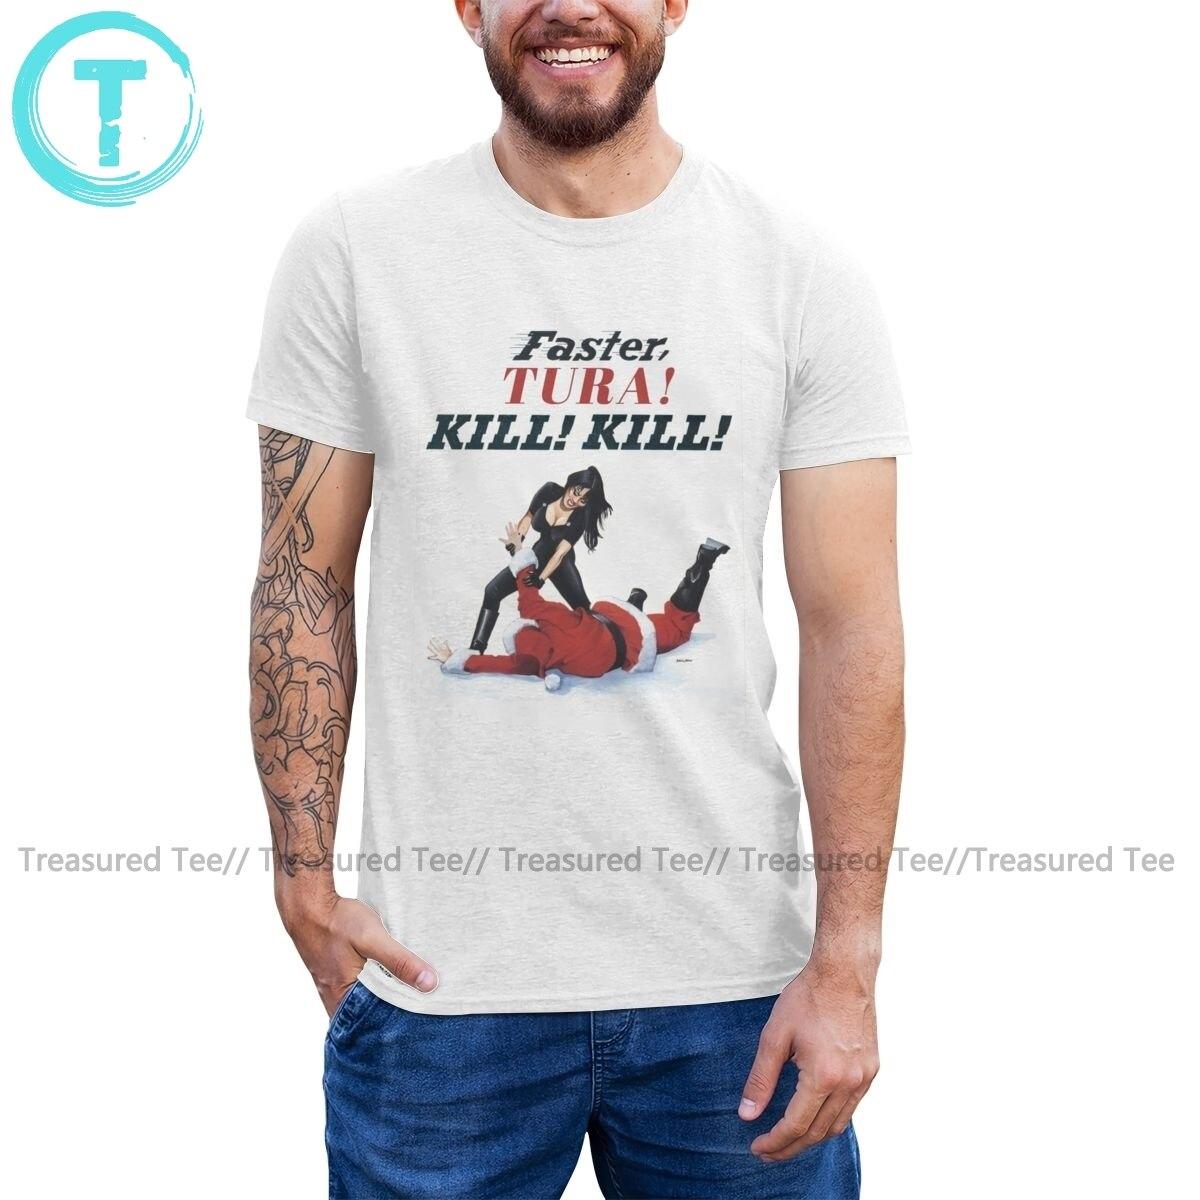 Сатана футболка быстрее тура убить Стивен Стинс футболка ХХХ Футболка с принтом отличная футболка